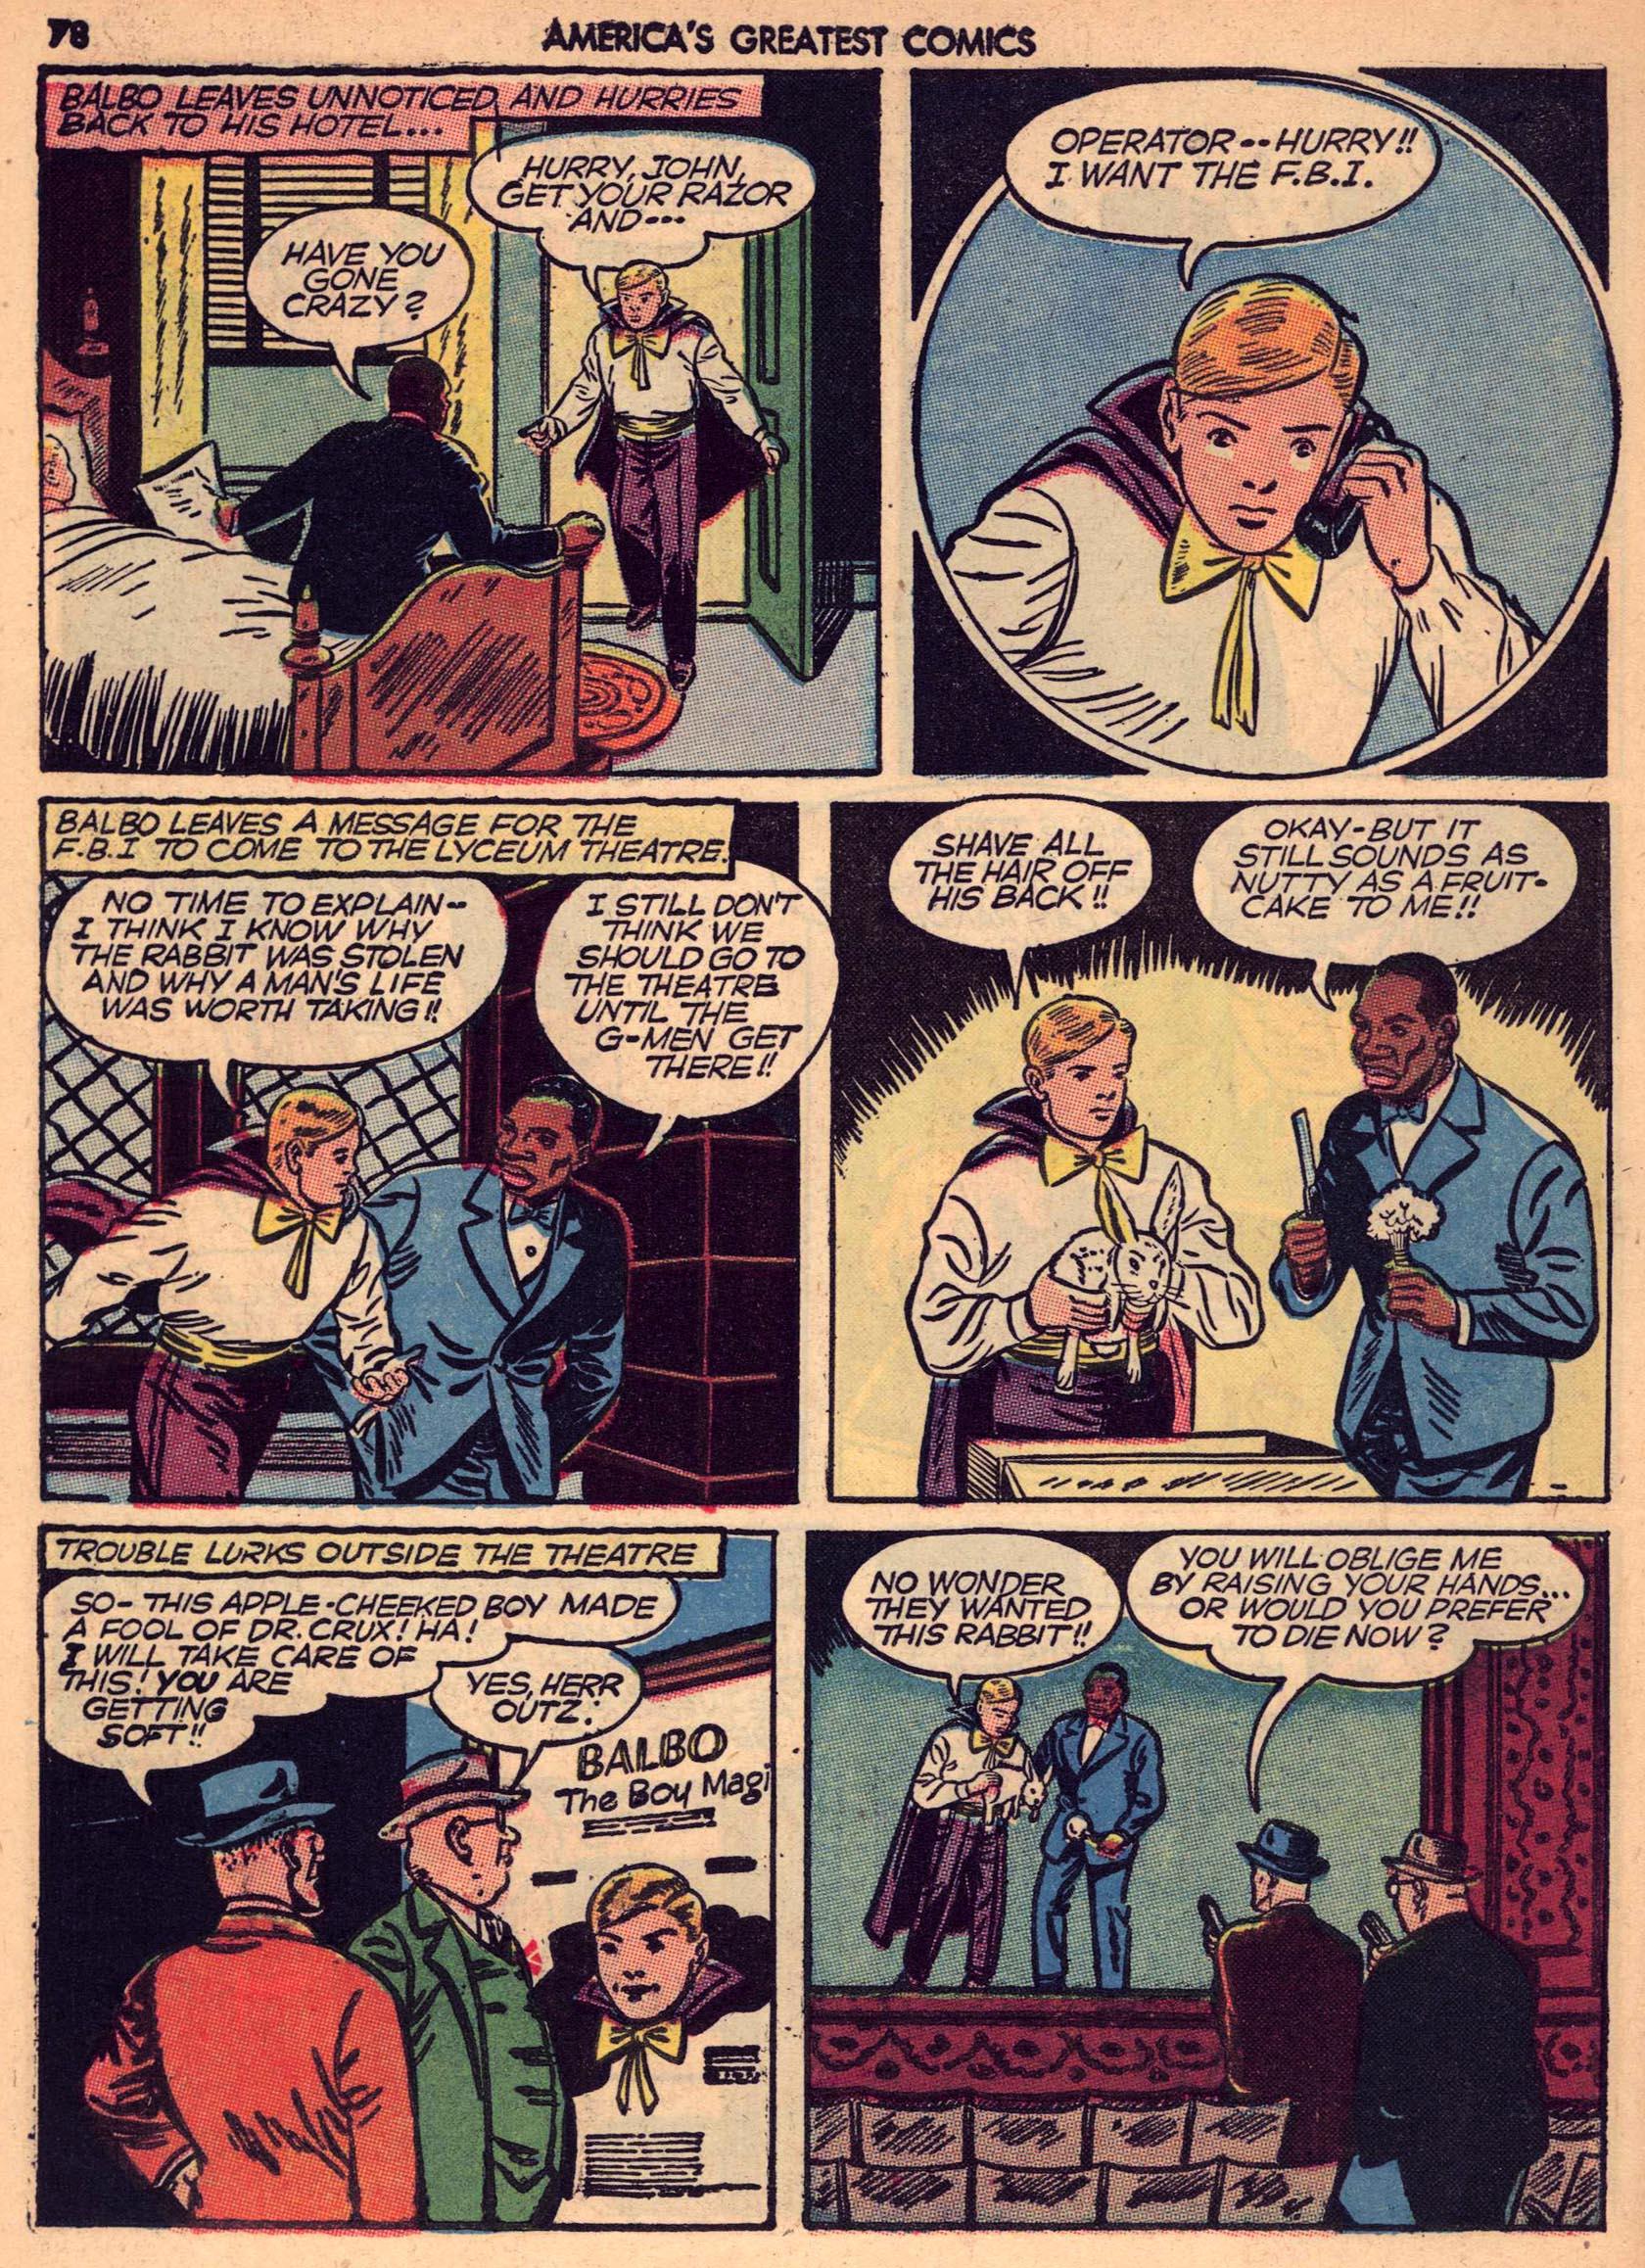 Read online America's Greatest Comics comic -  Issue #7 - 77